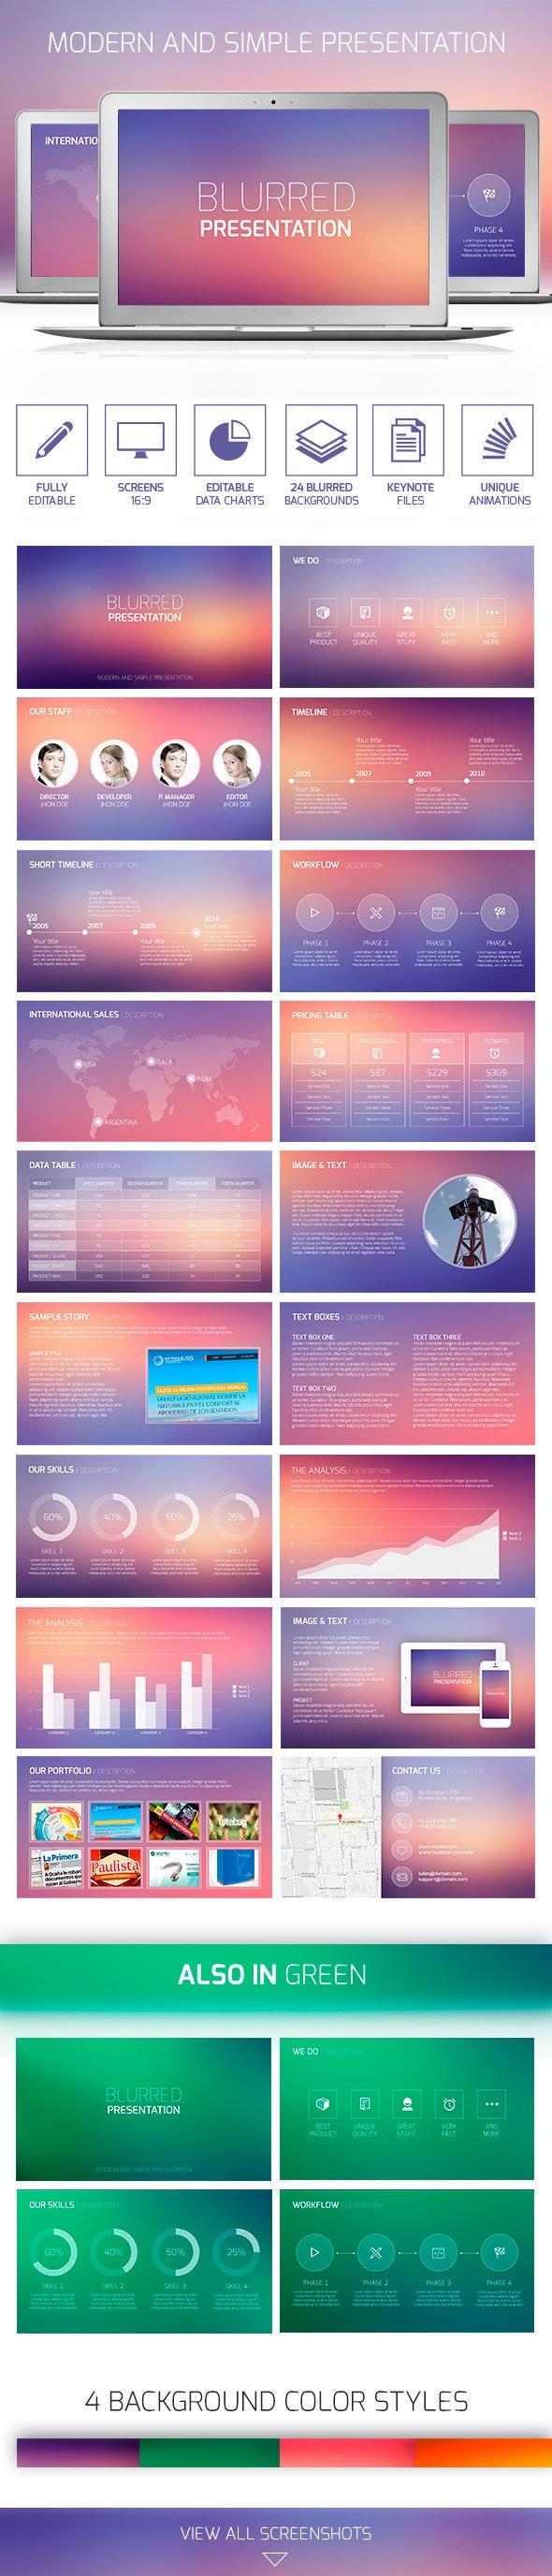 Blurred Presentation - Keynote Templates Presentation Templates